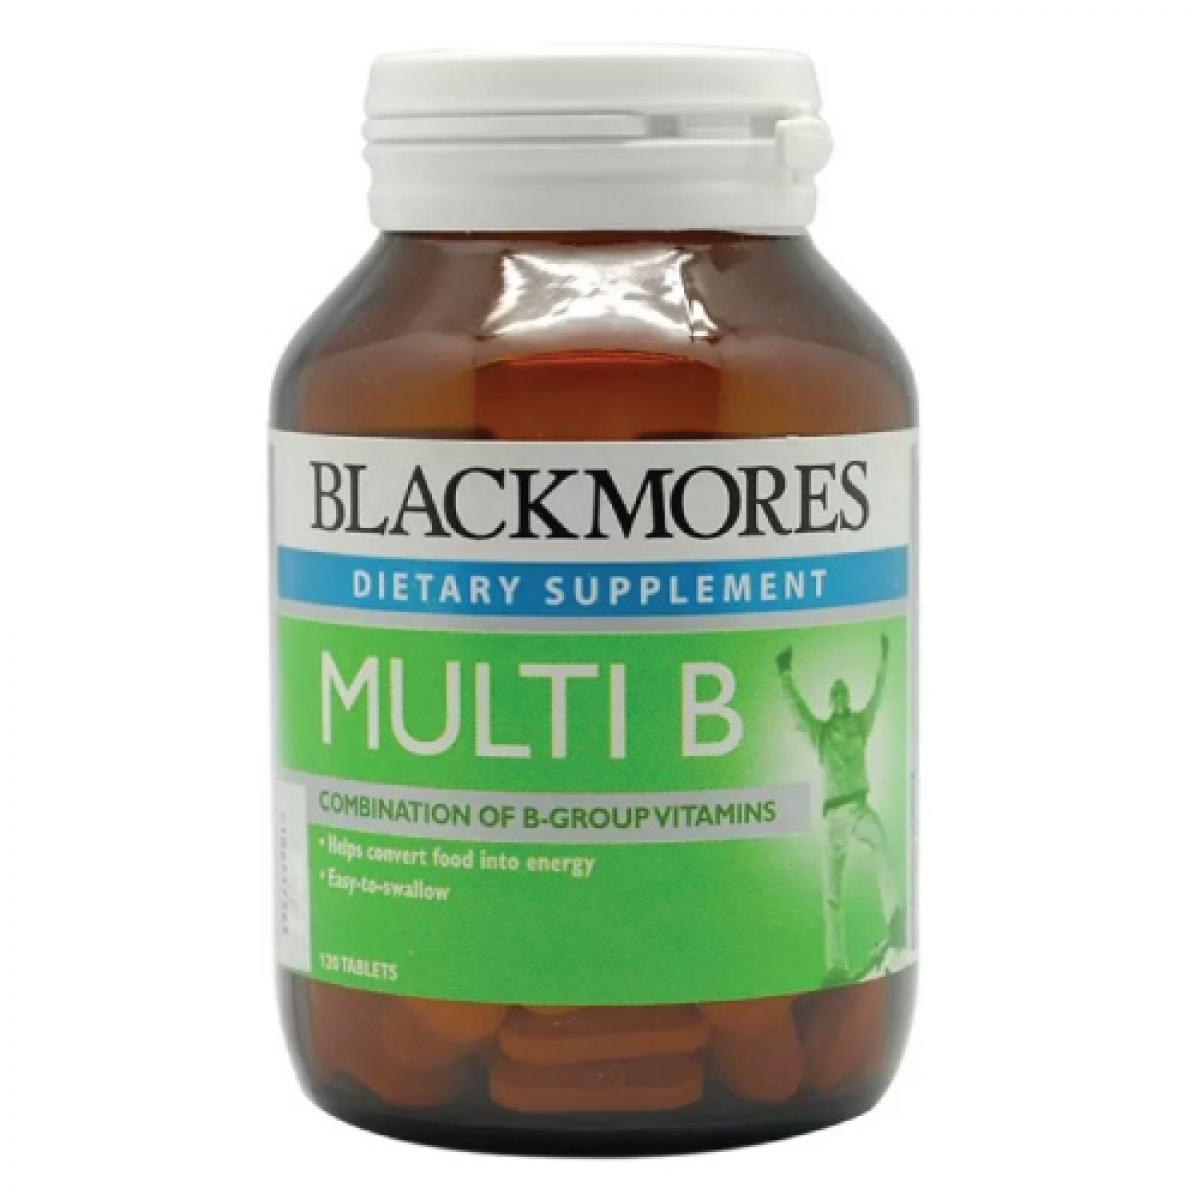 Blackmores Multi B - B Complex Vitamins - Shop Journey